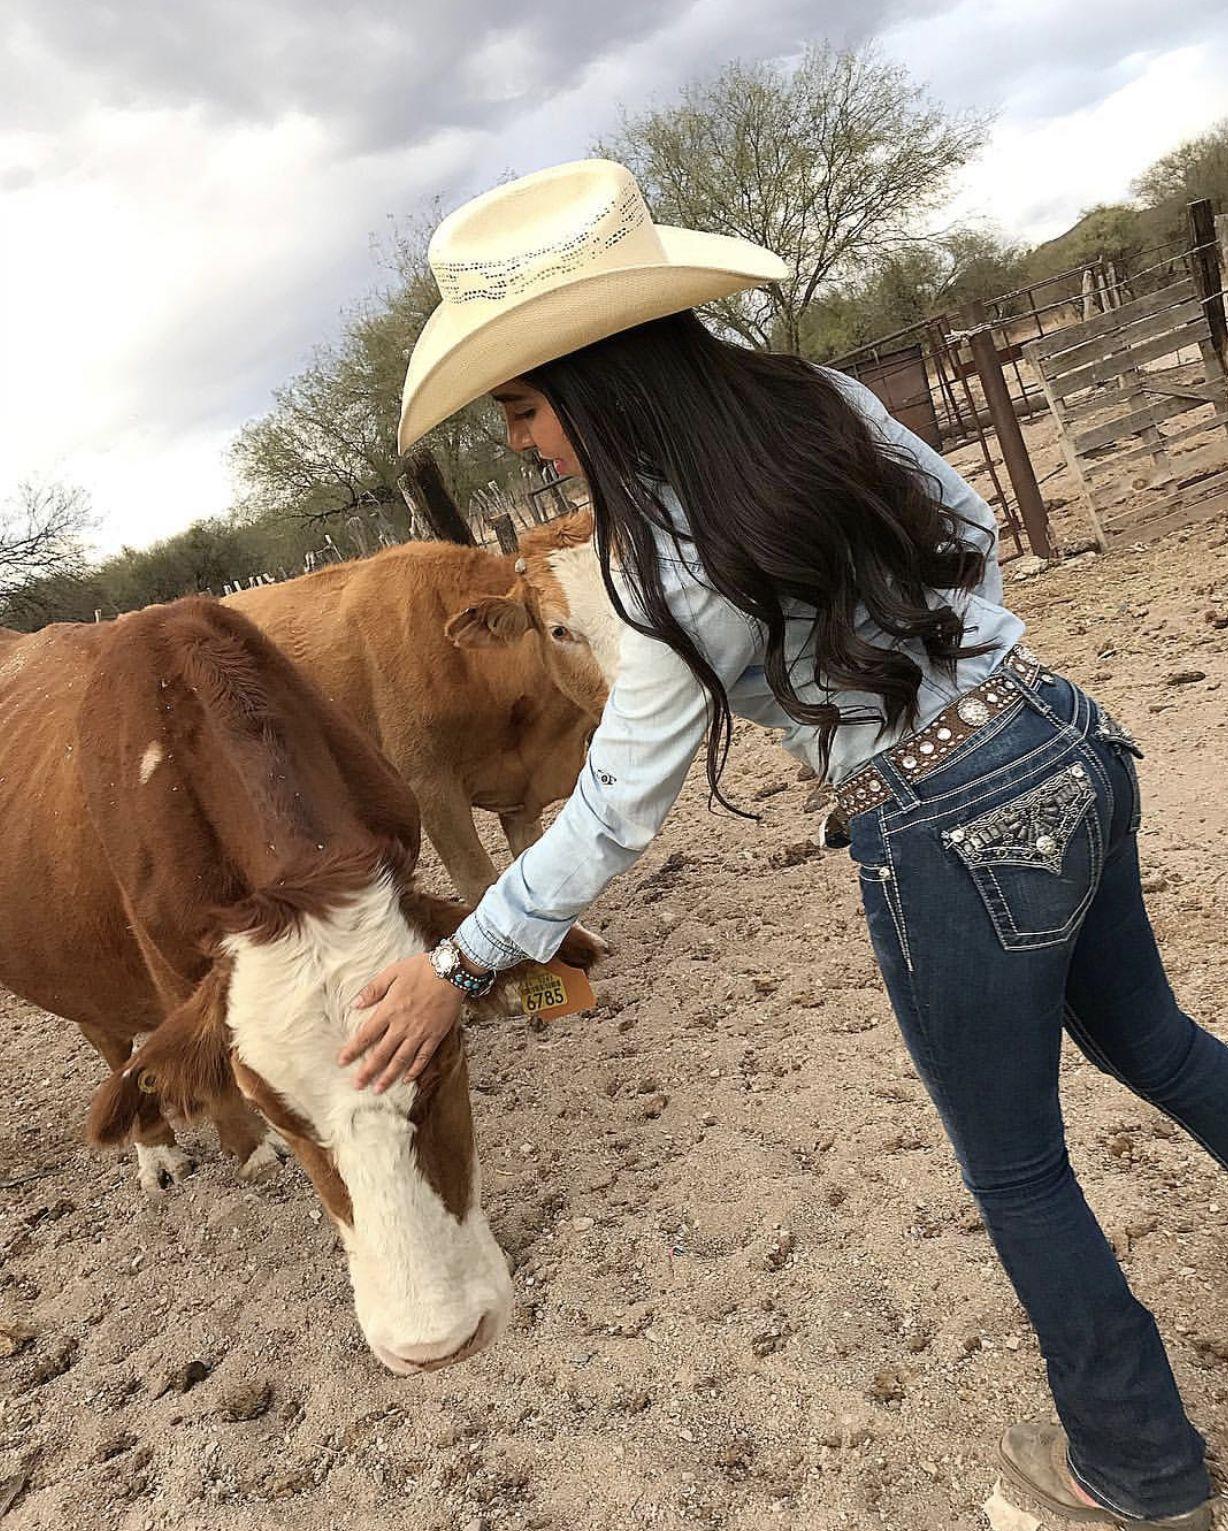 Pin by Suzyyy💓 on v a q u e r a in 2019 | Cowboy boot ...